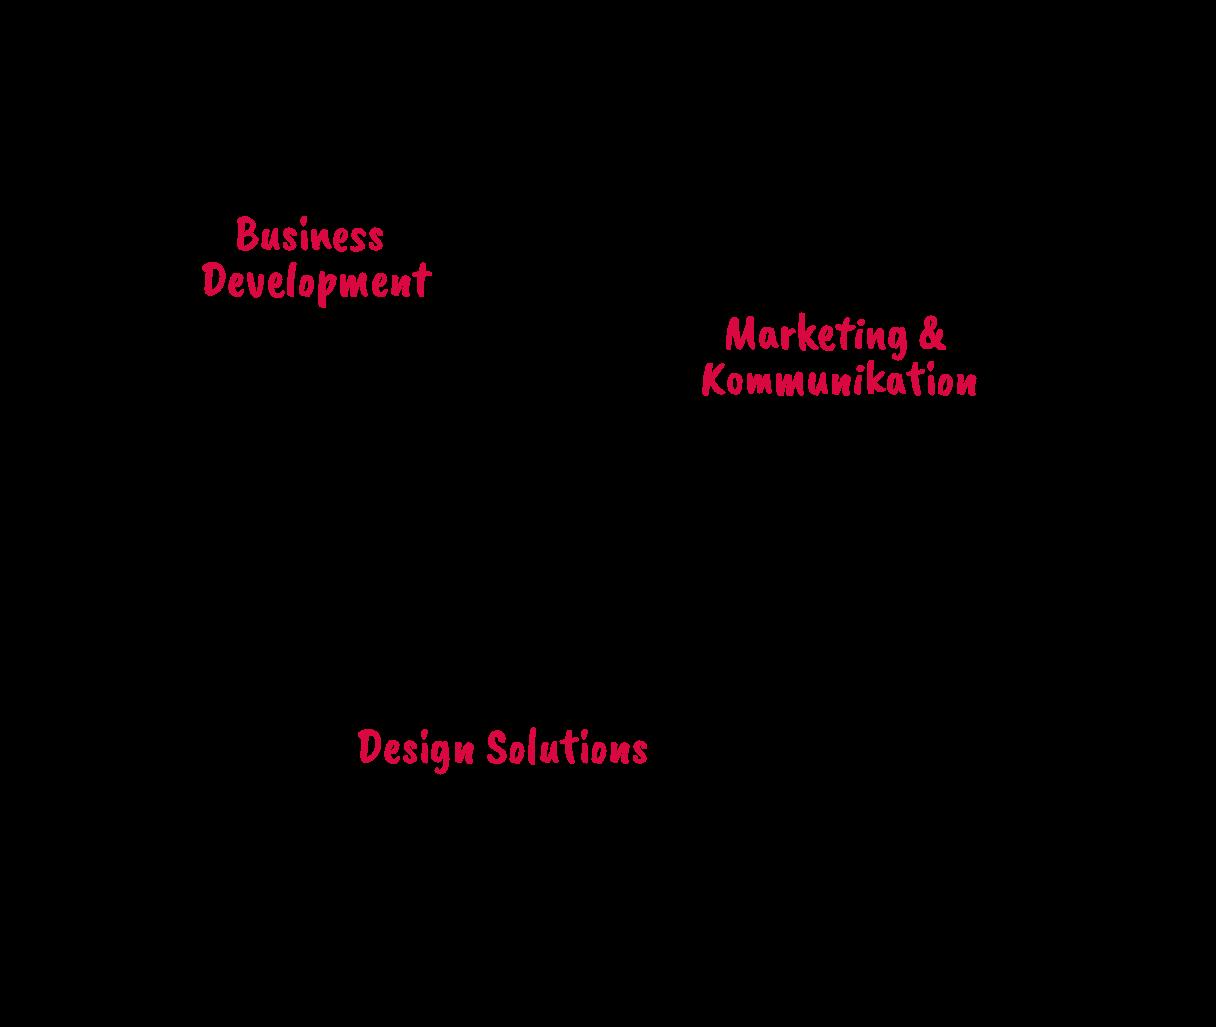 The three pillars of GUTJAHR: Business Development, Marketing & Communication and Design Solutions